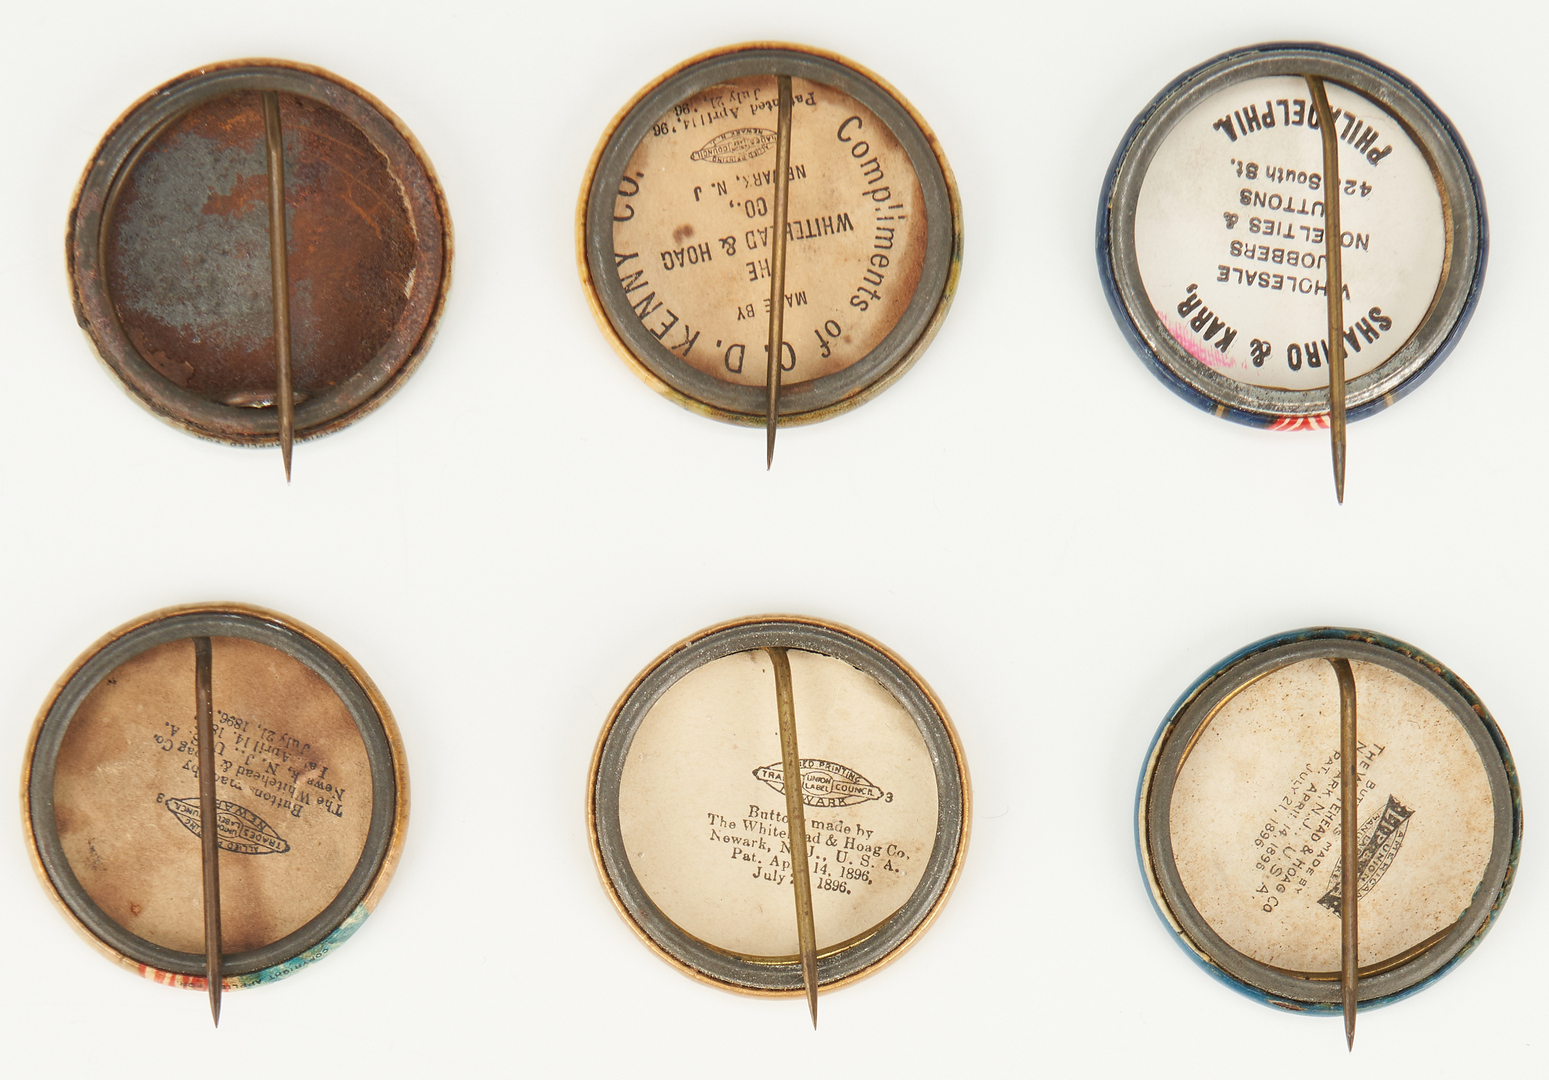 Lot 659: 10 Political Ephemera Items, incl. McKinley, Roosevelt, Taft